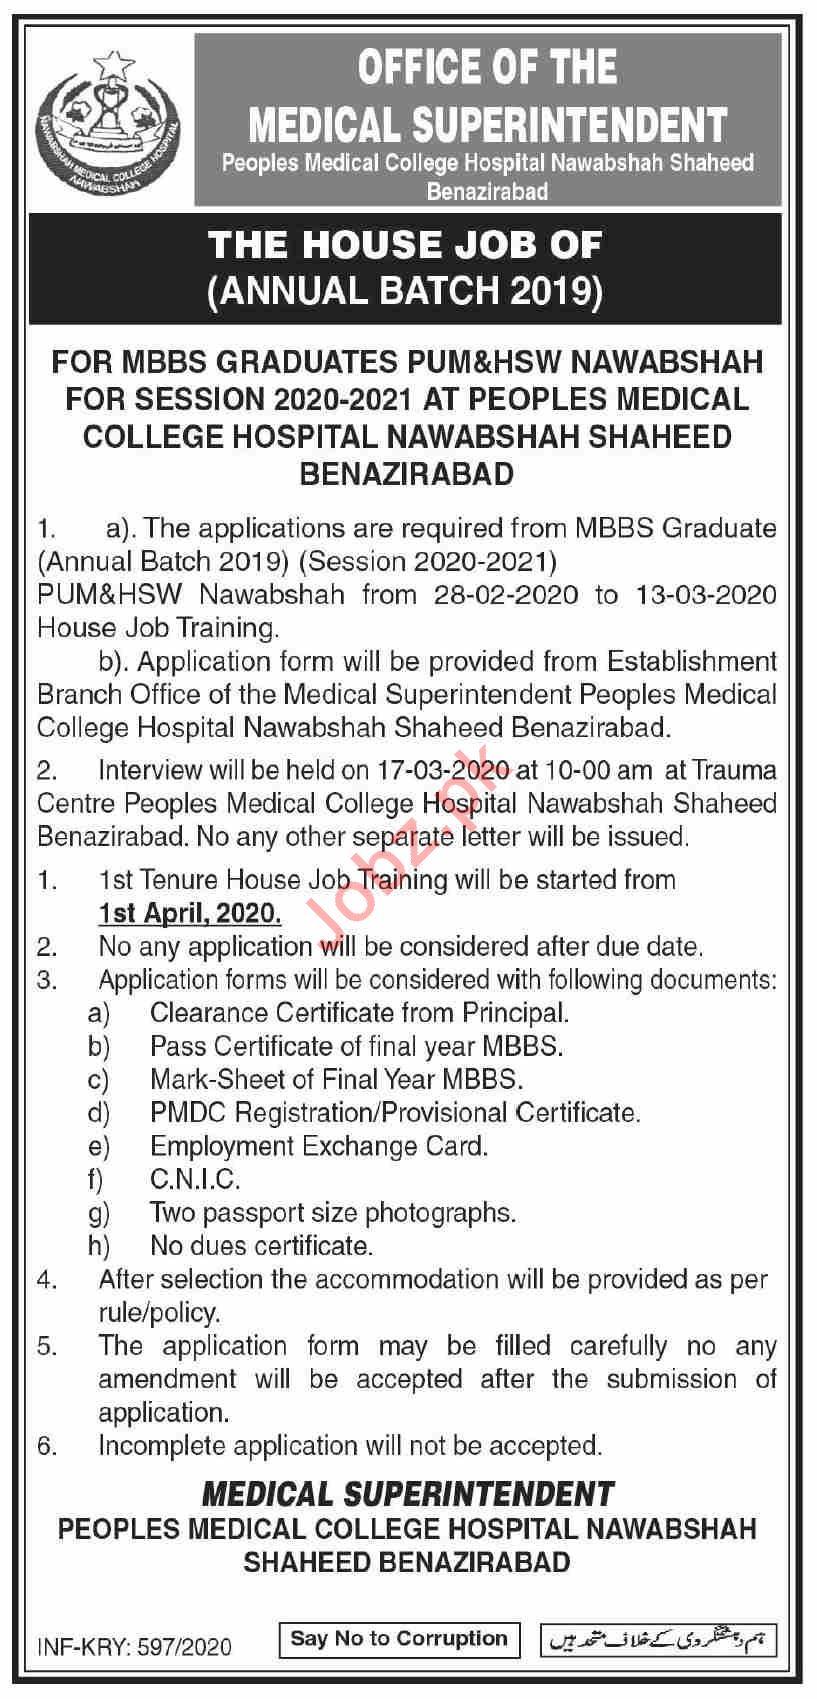 Peoples Medical College Hospital Nawabshah House Jobs 2020